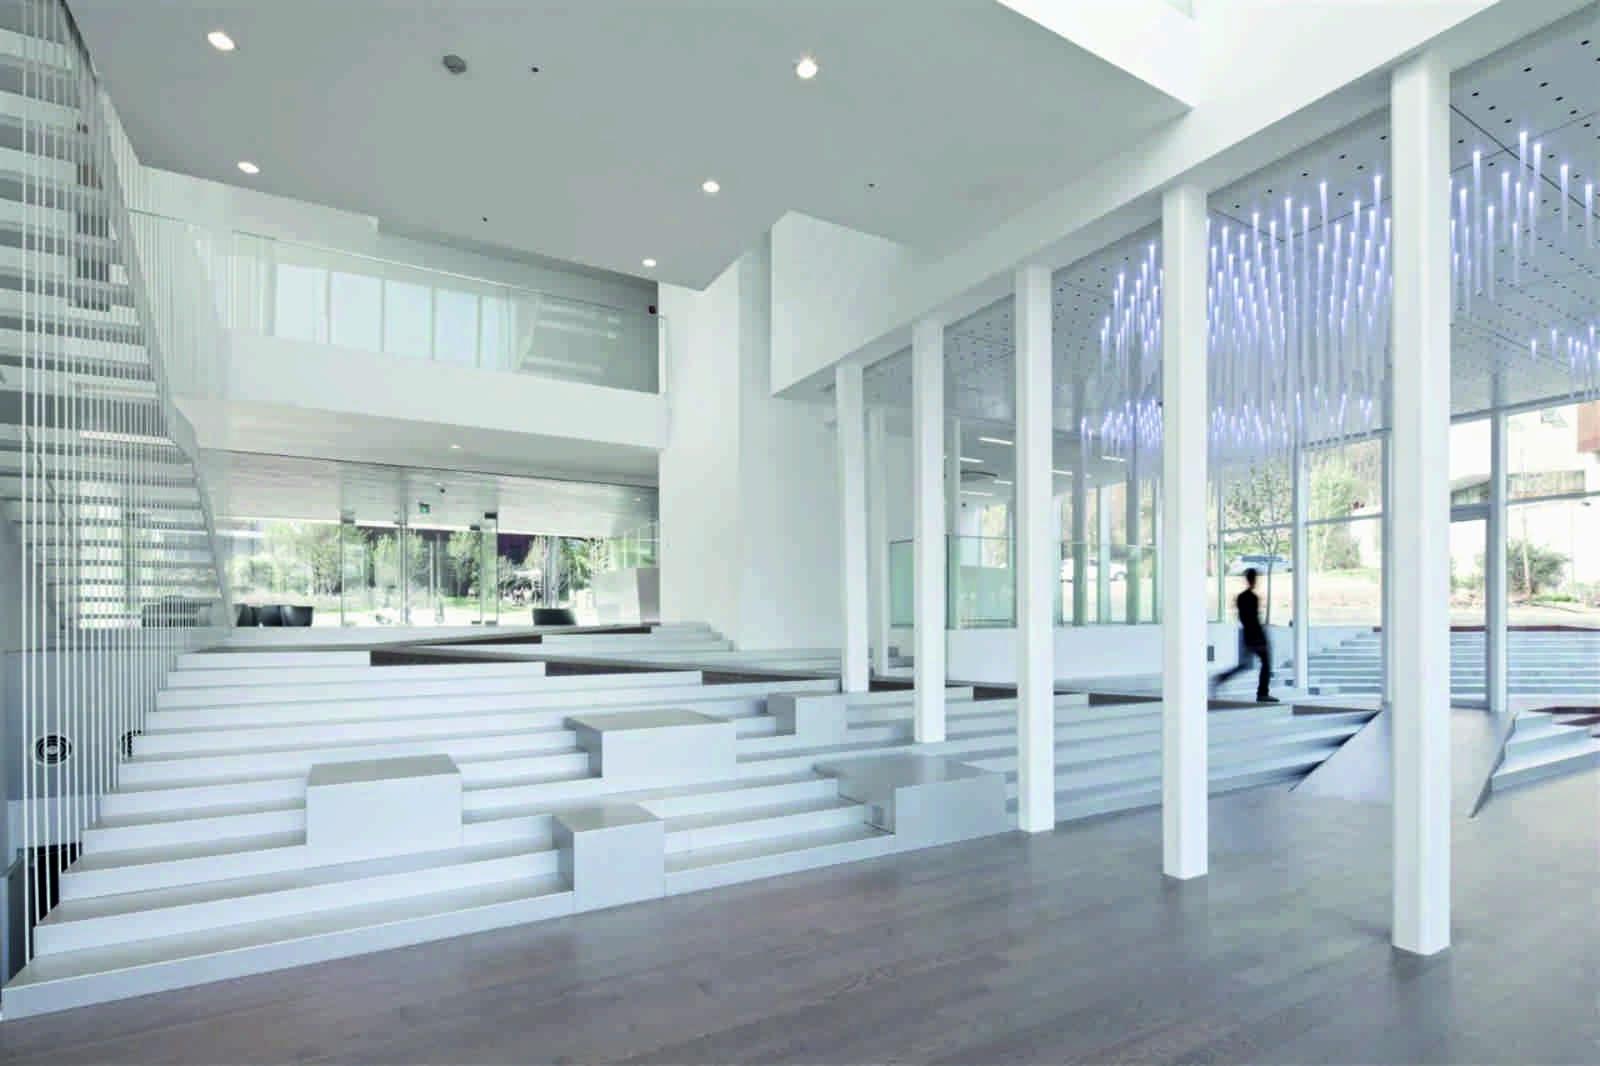 Gallery Space Design WHITE BLOCK GAL...